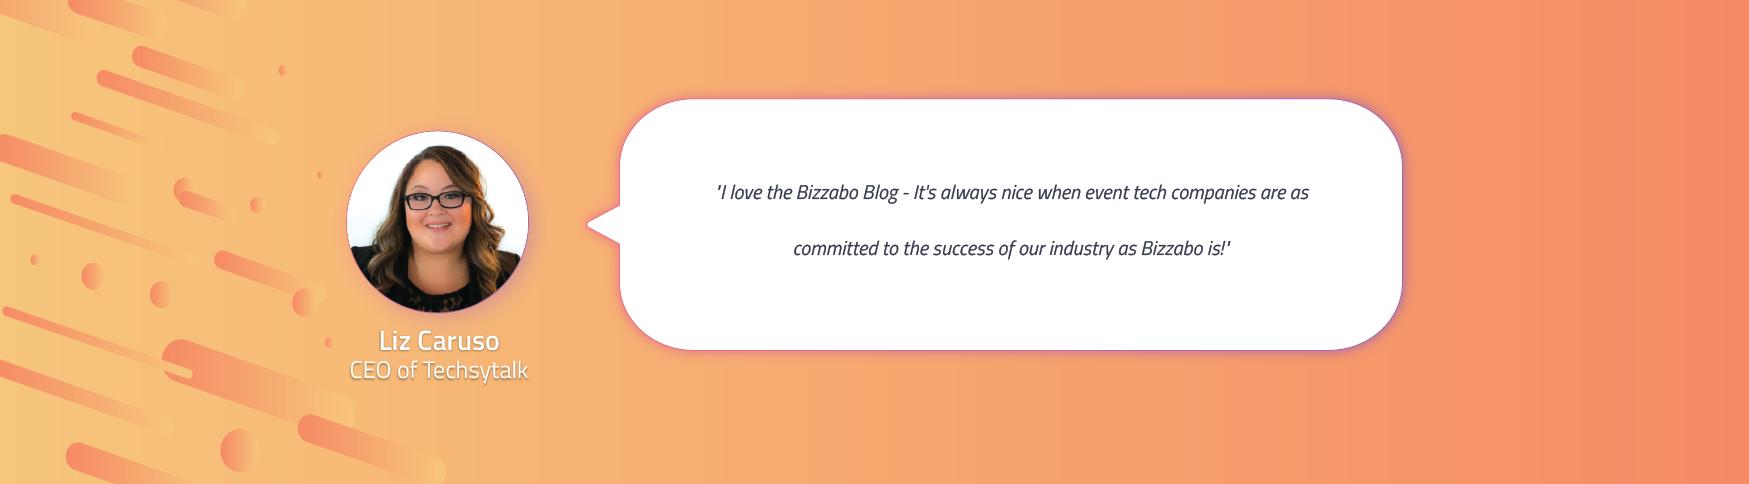 Liz King's Endorsement of the Bizzabo Blog